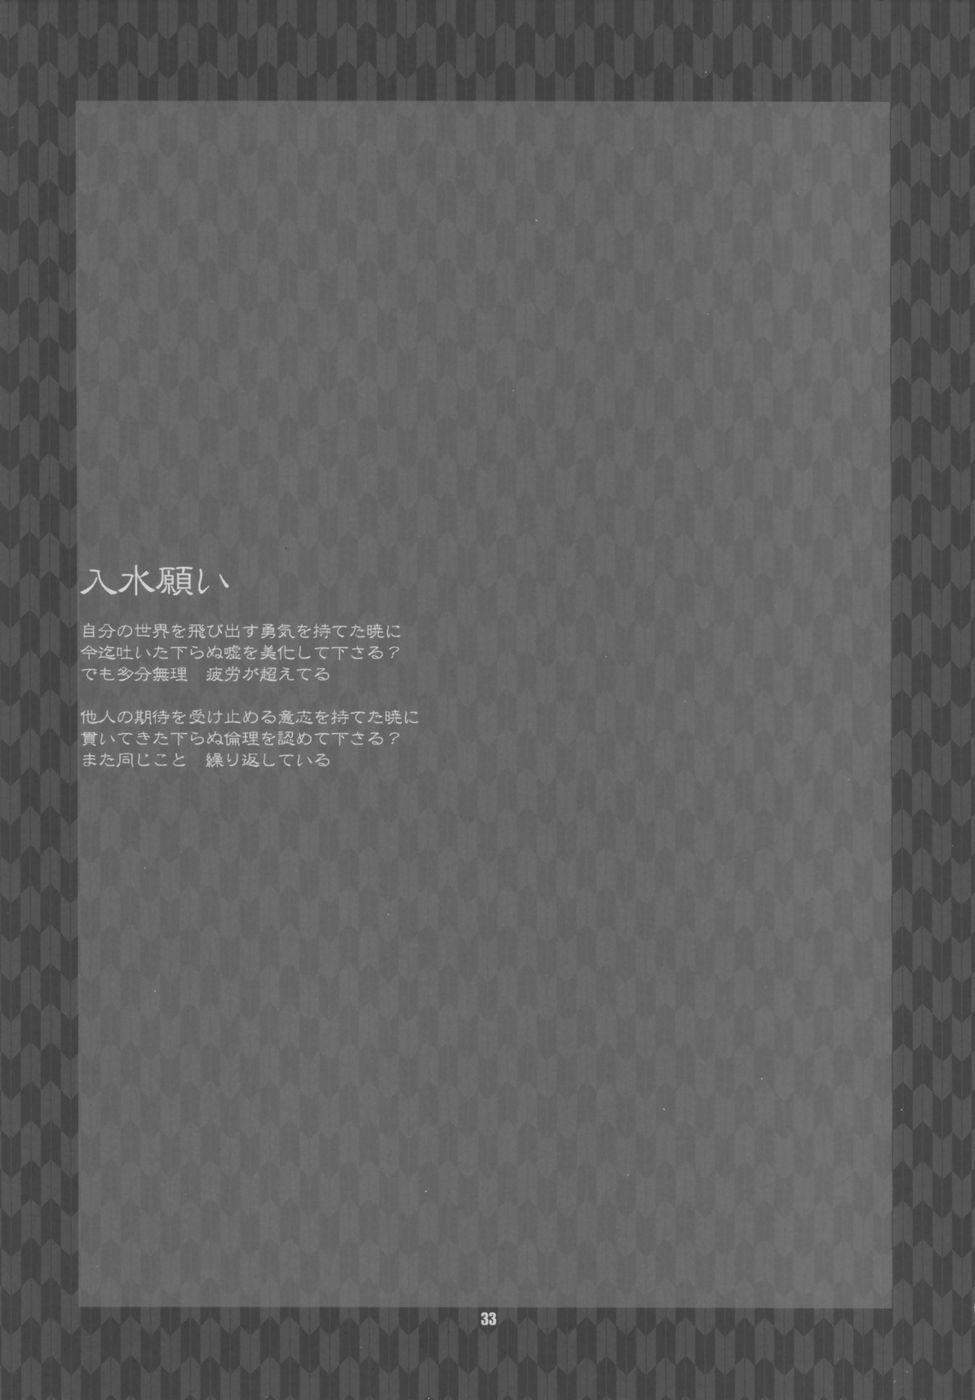 Himitsu - The Secret 32